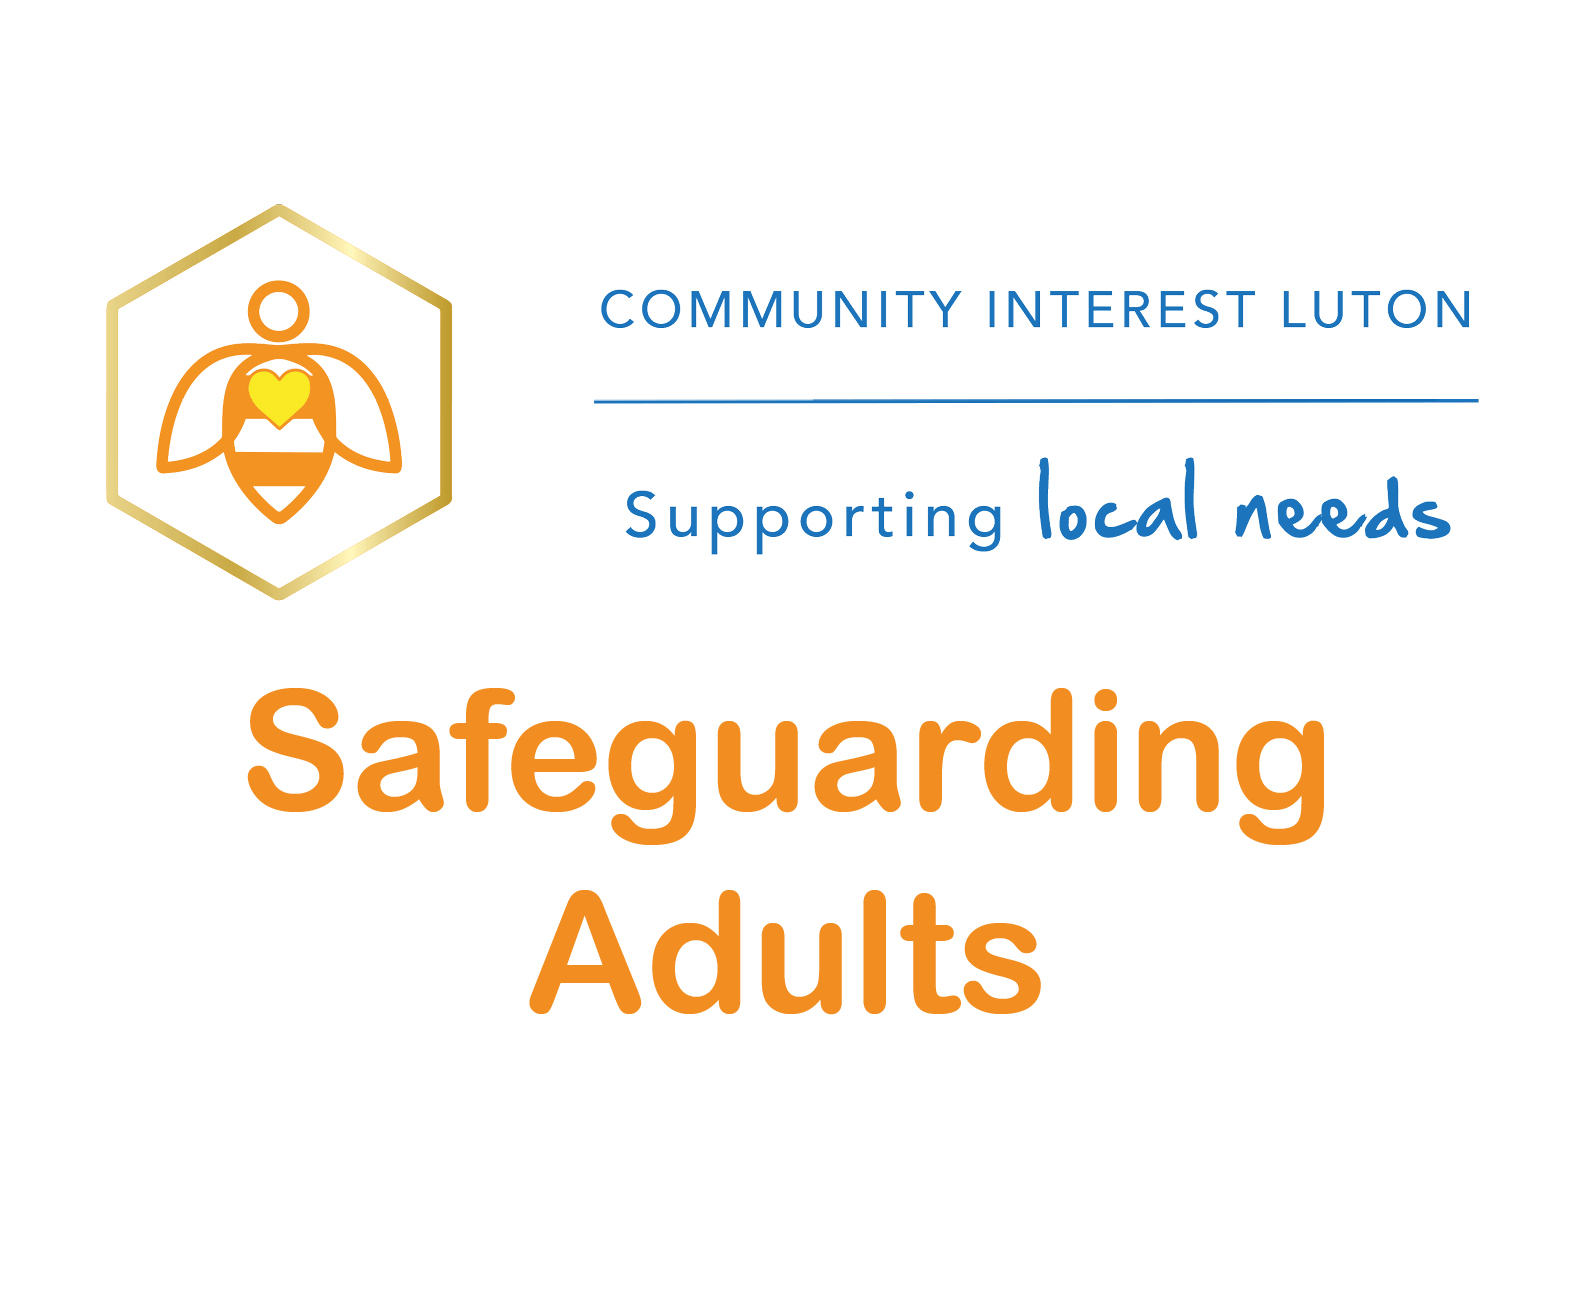 Safeguard Adults